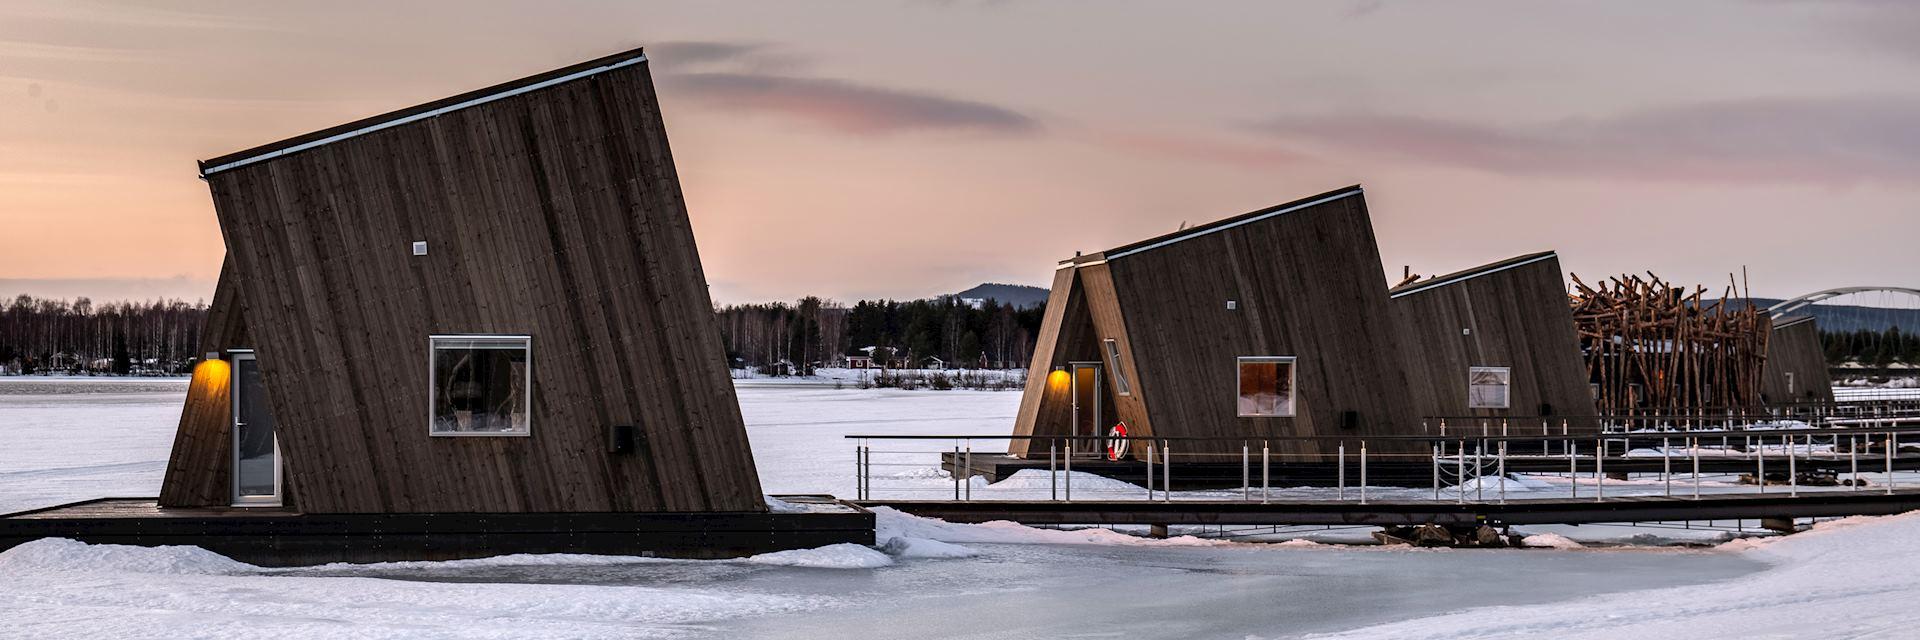 Arctic Bath, Sweden